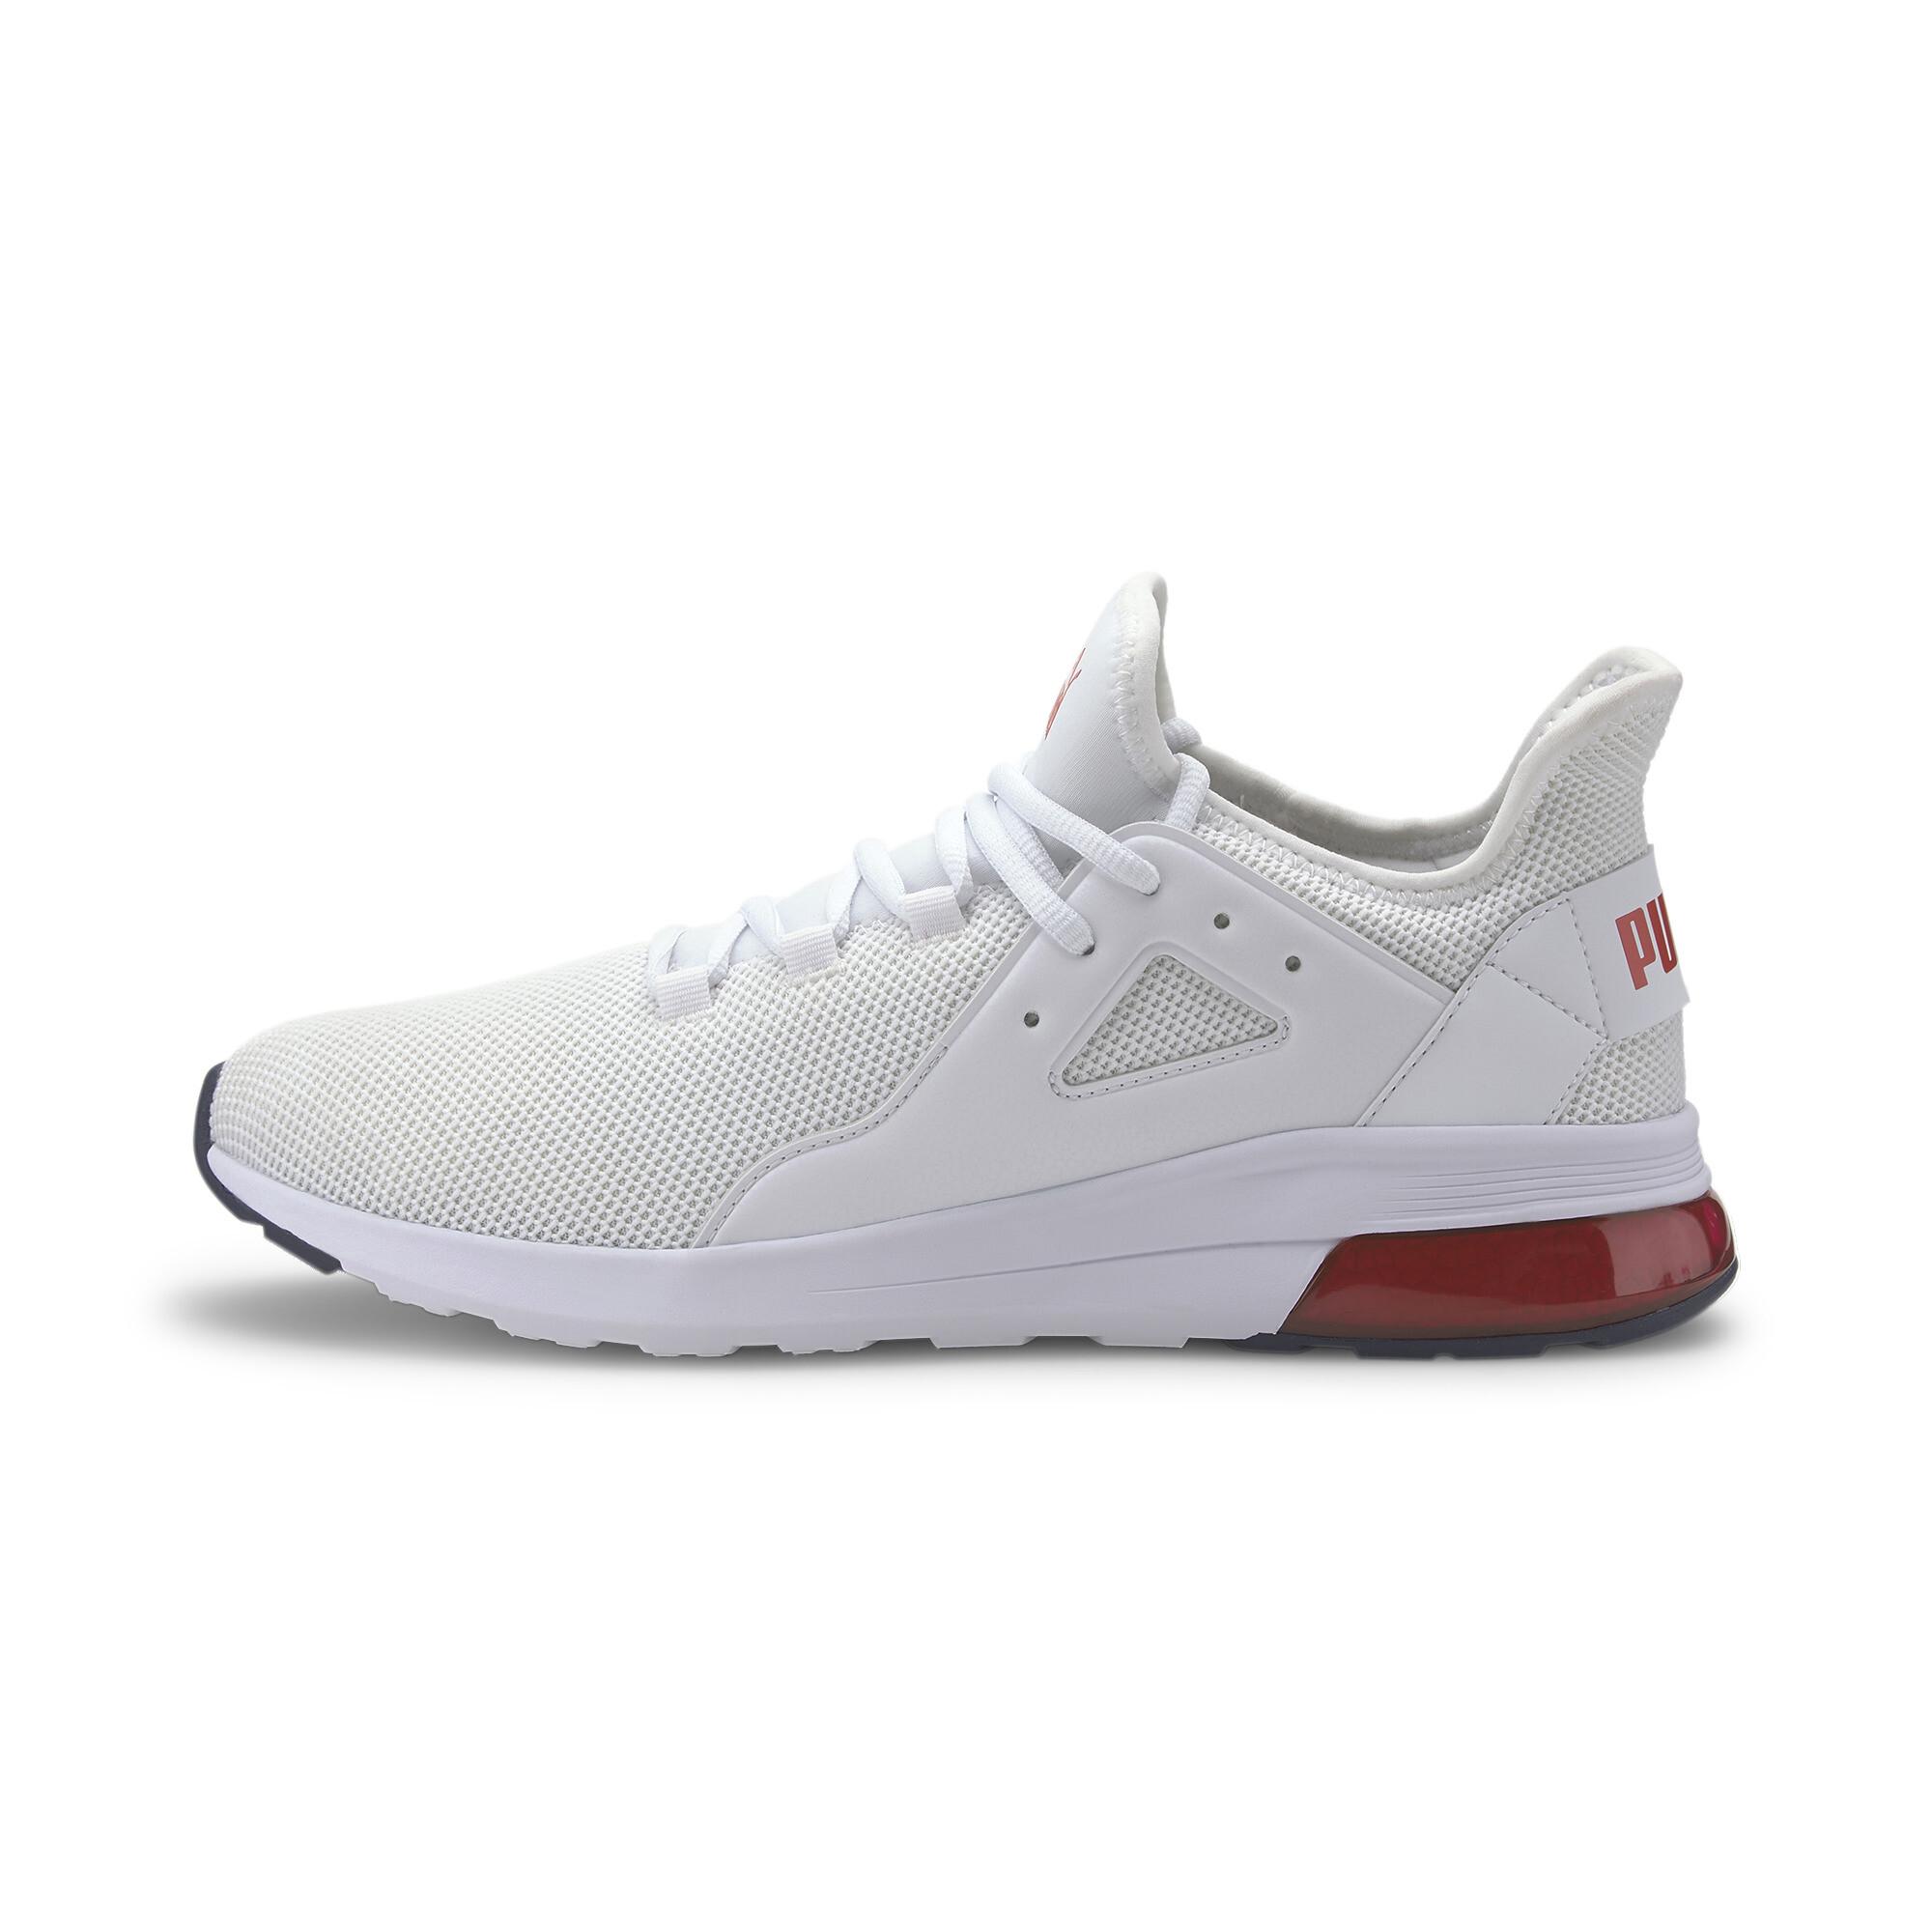 PUMA-Electron-Street-Men-039-s-Sneakers-Men-Shoe-Basics thumbnail 16